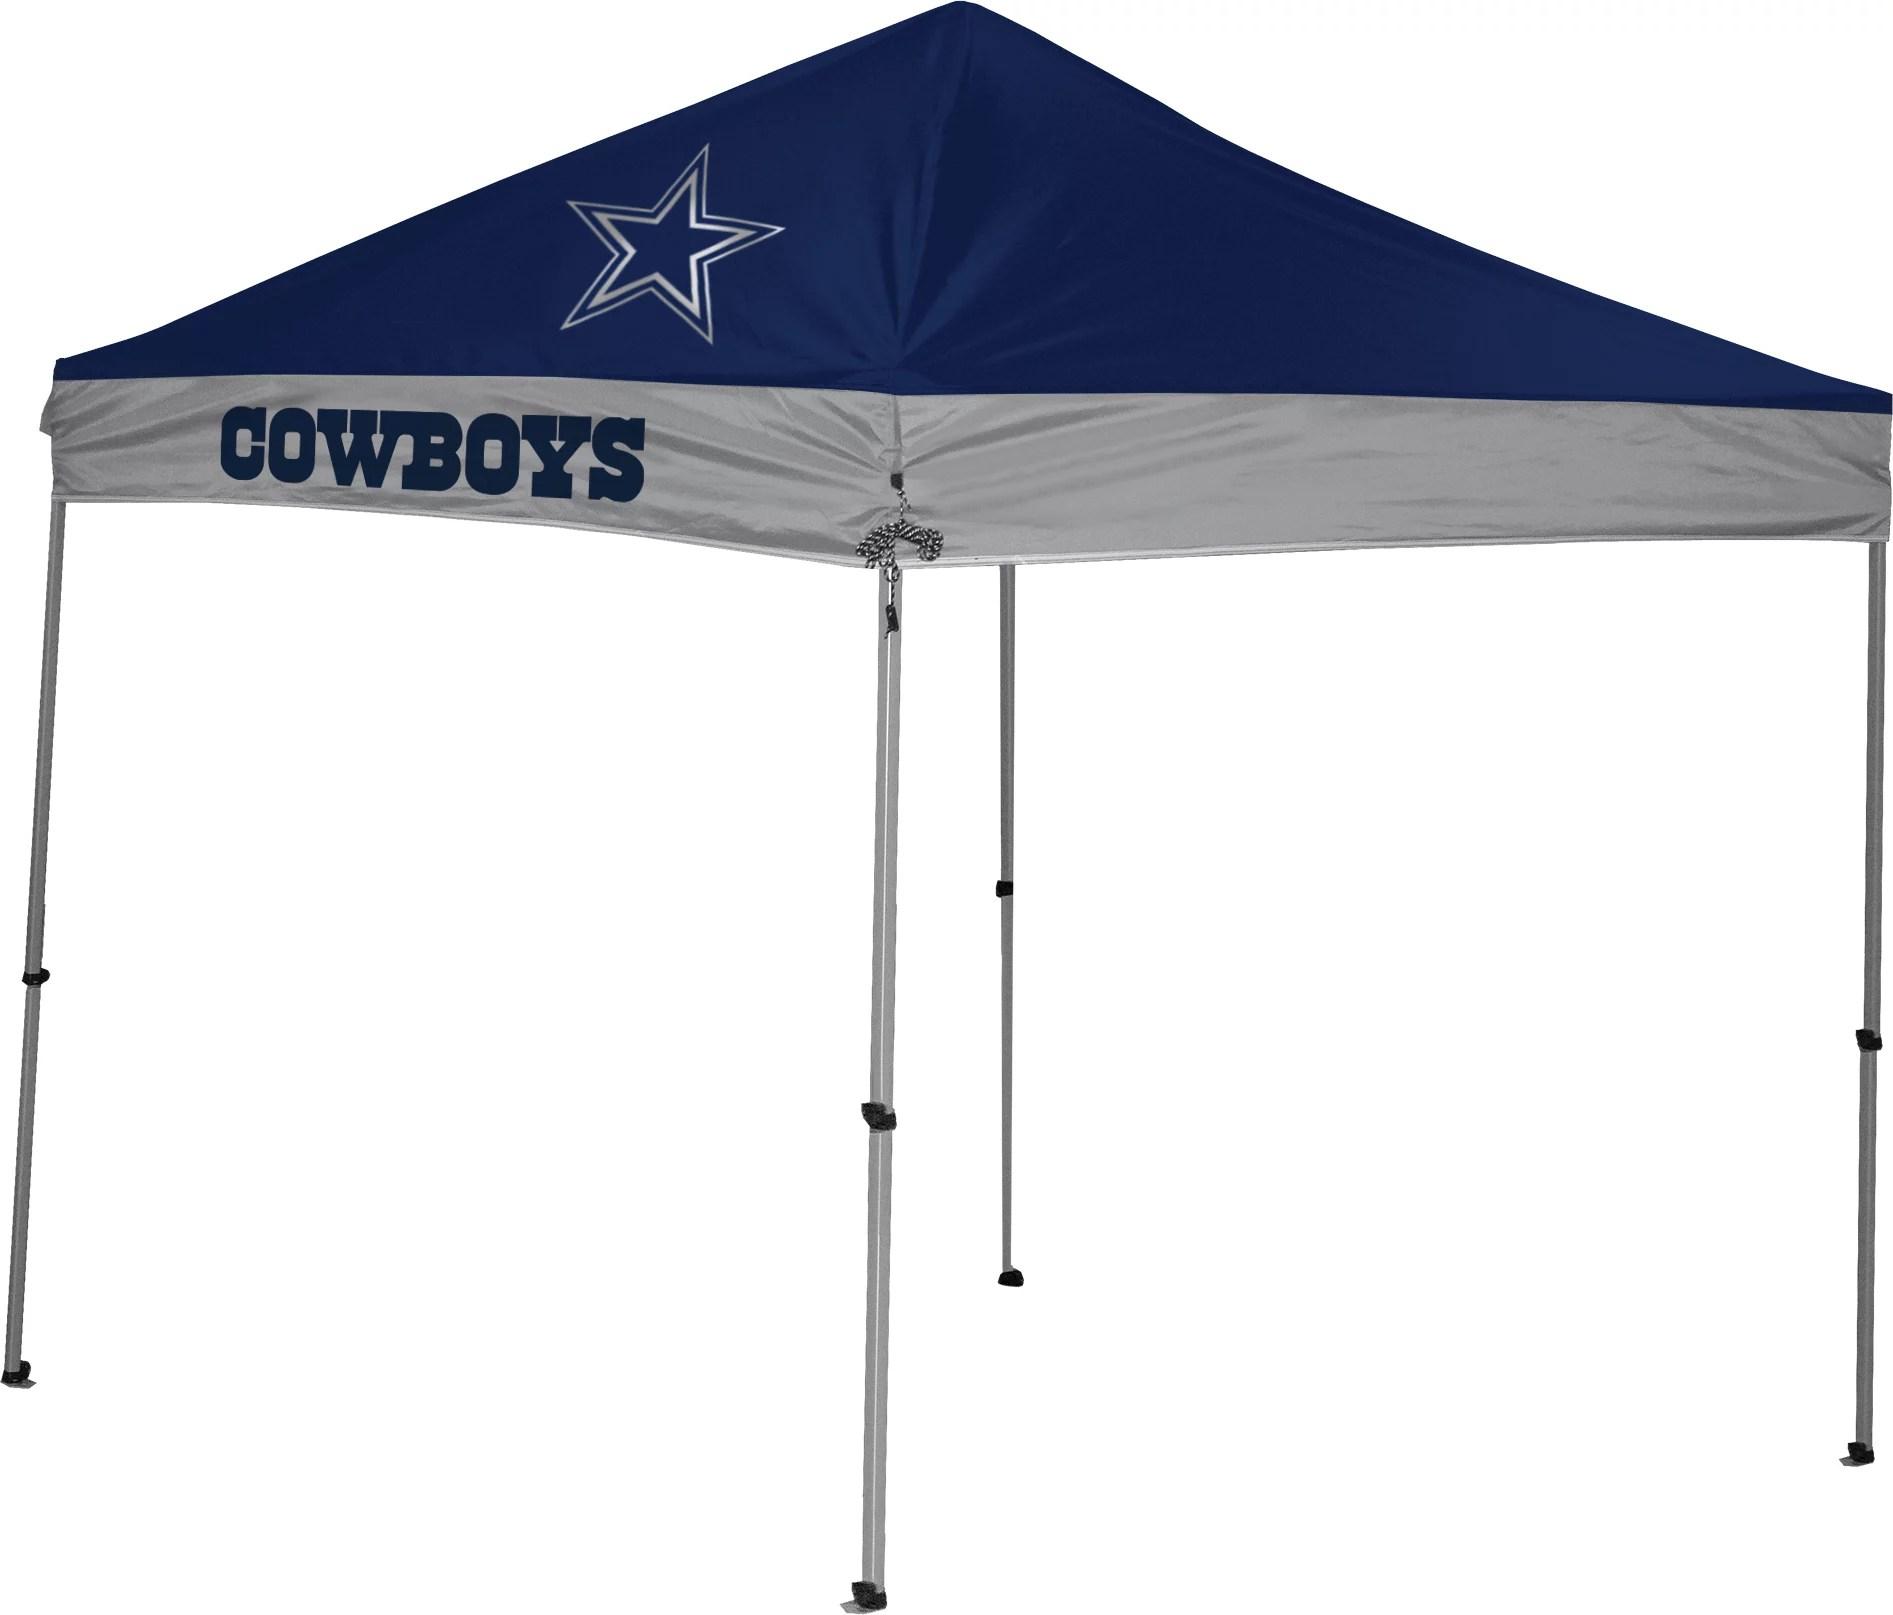 rawlings dallas cowboys 9 x9 canopy tent